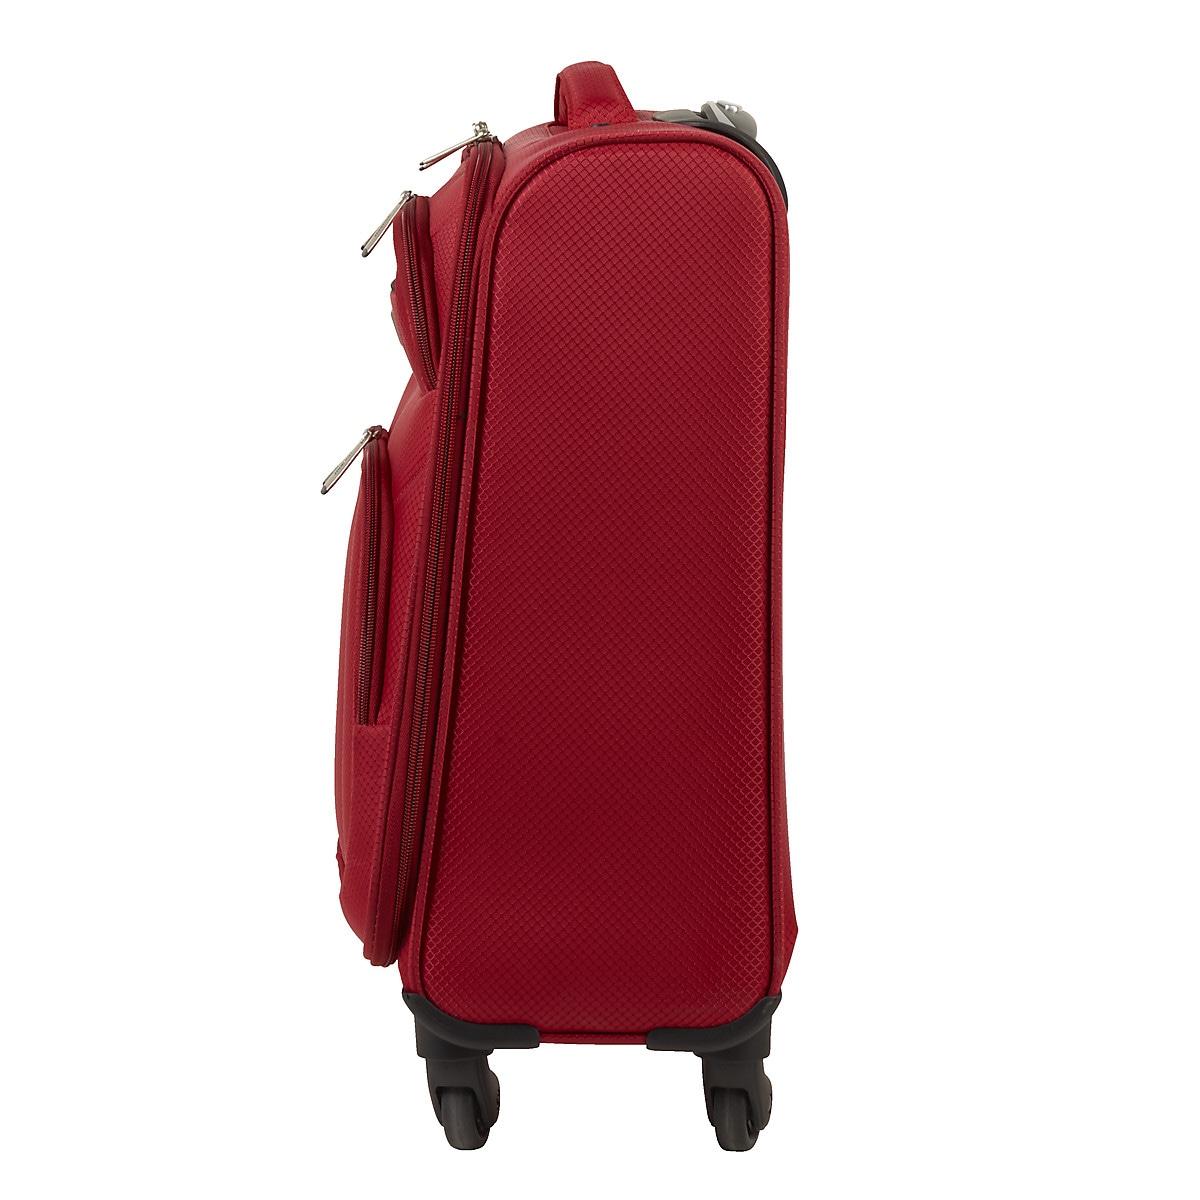 Matkalaukku Asaklitt Lightweight, punainen